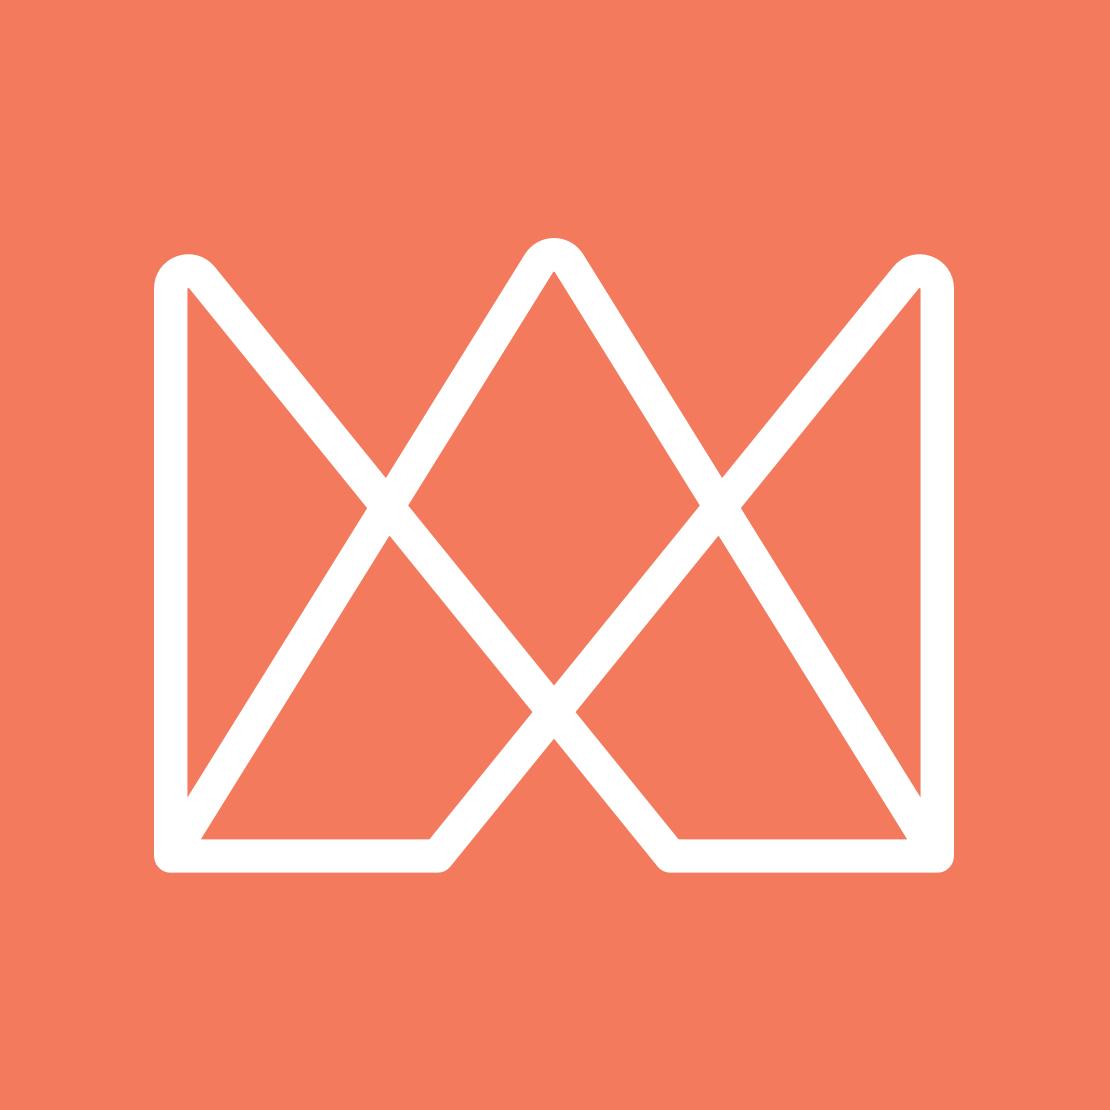 Affinity Works – brandmark reversed